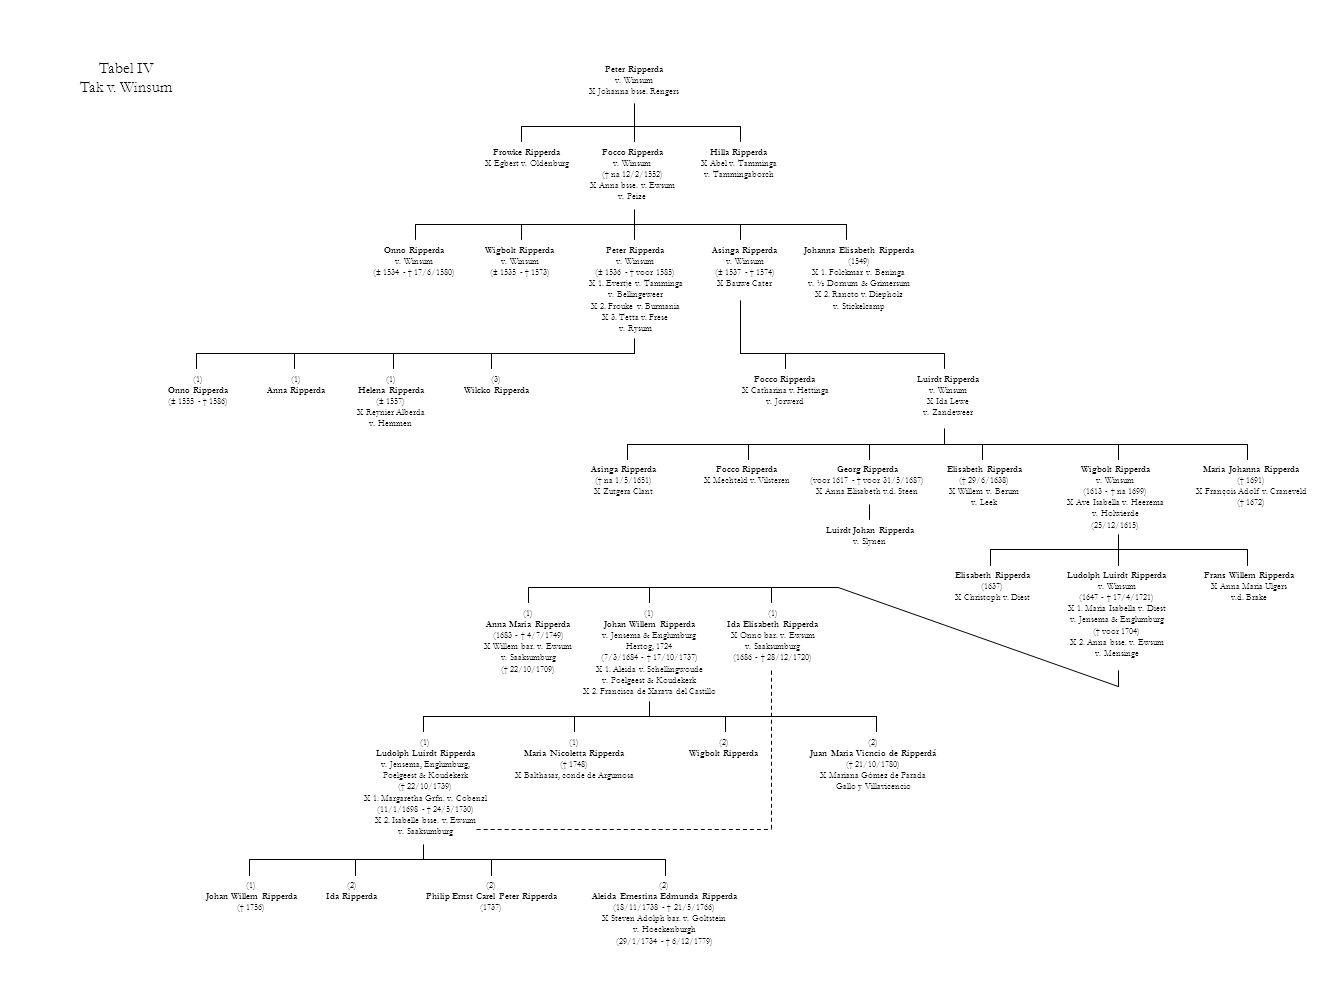 Tabel IV Tak v. Winsum Peter Ripperda v. Winsum X Johanna bsse. Rengers Frowke Ripperda X Egbert v. Oldenburg Focco Ripperda v. Winsum († na 12/2/1552